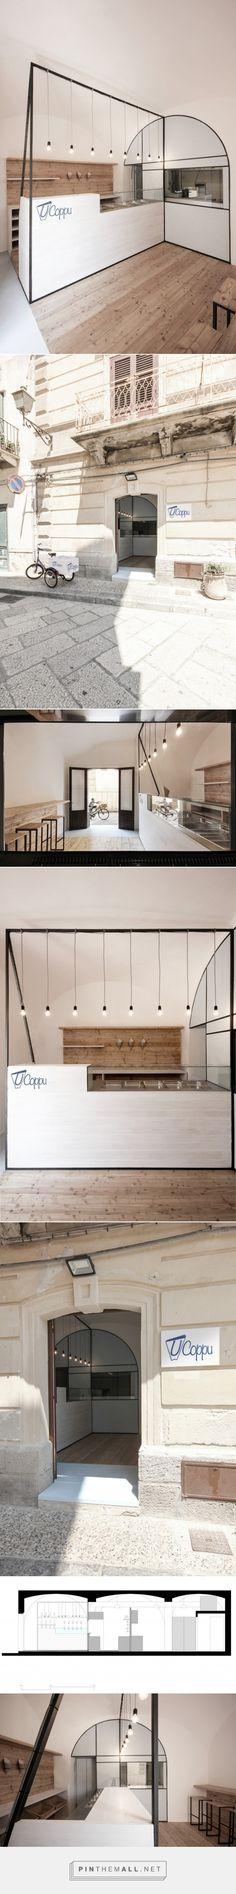 U Coppu  / Studio DiDeA + Dario De Benedictis | ArchDaily - created via https://pinthemall.net